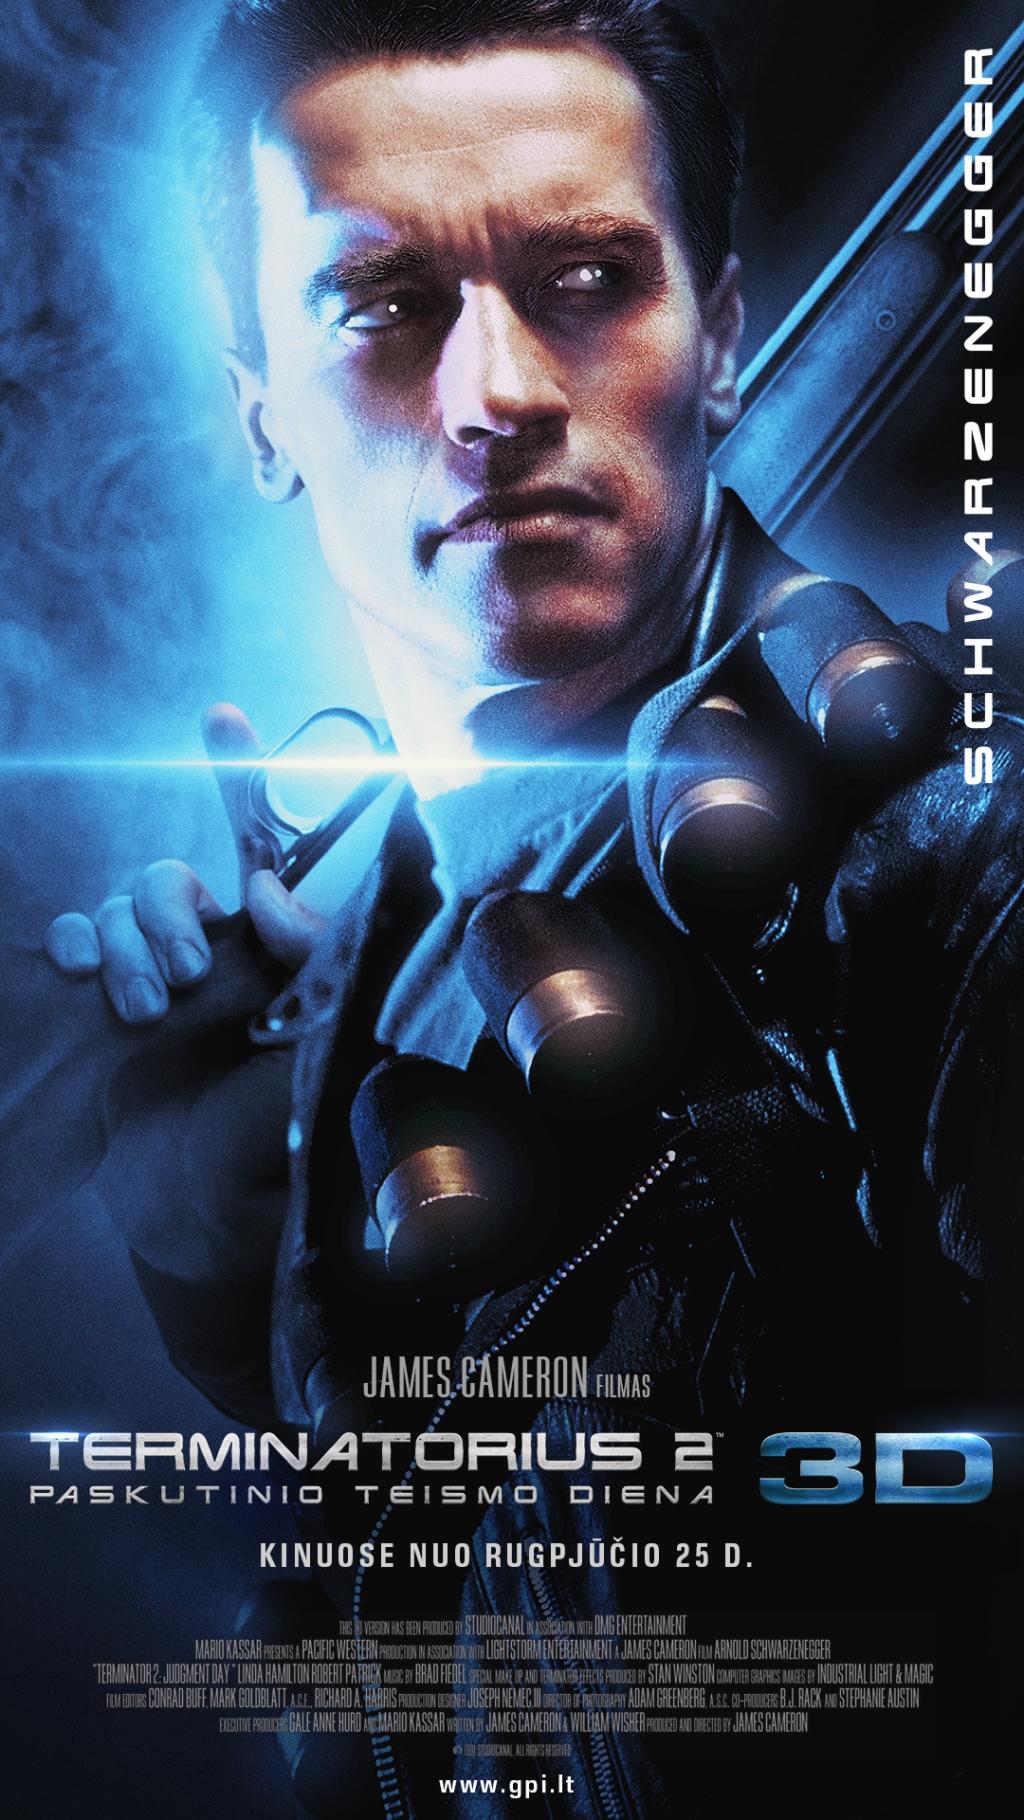 Terminatorius 2. Paskutinio teismo diena 3D (Terminator 2: Judgement Day)